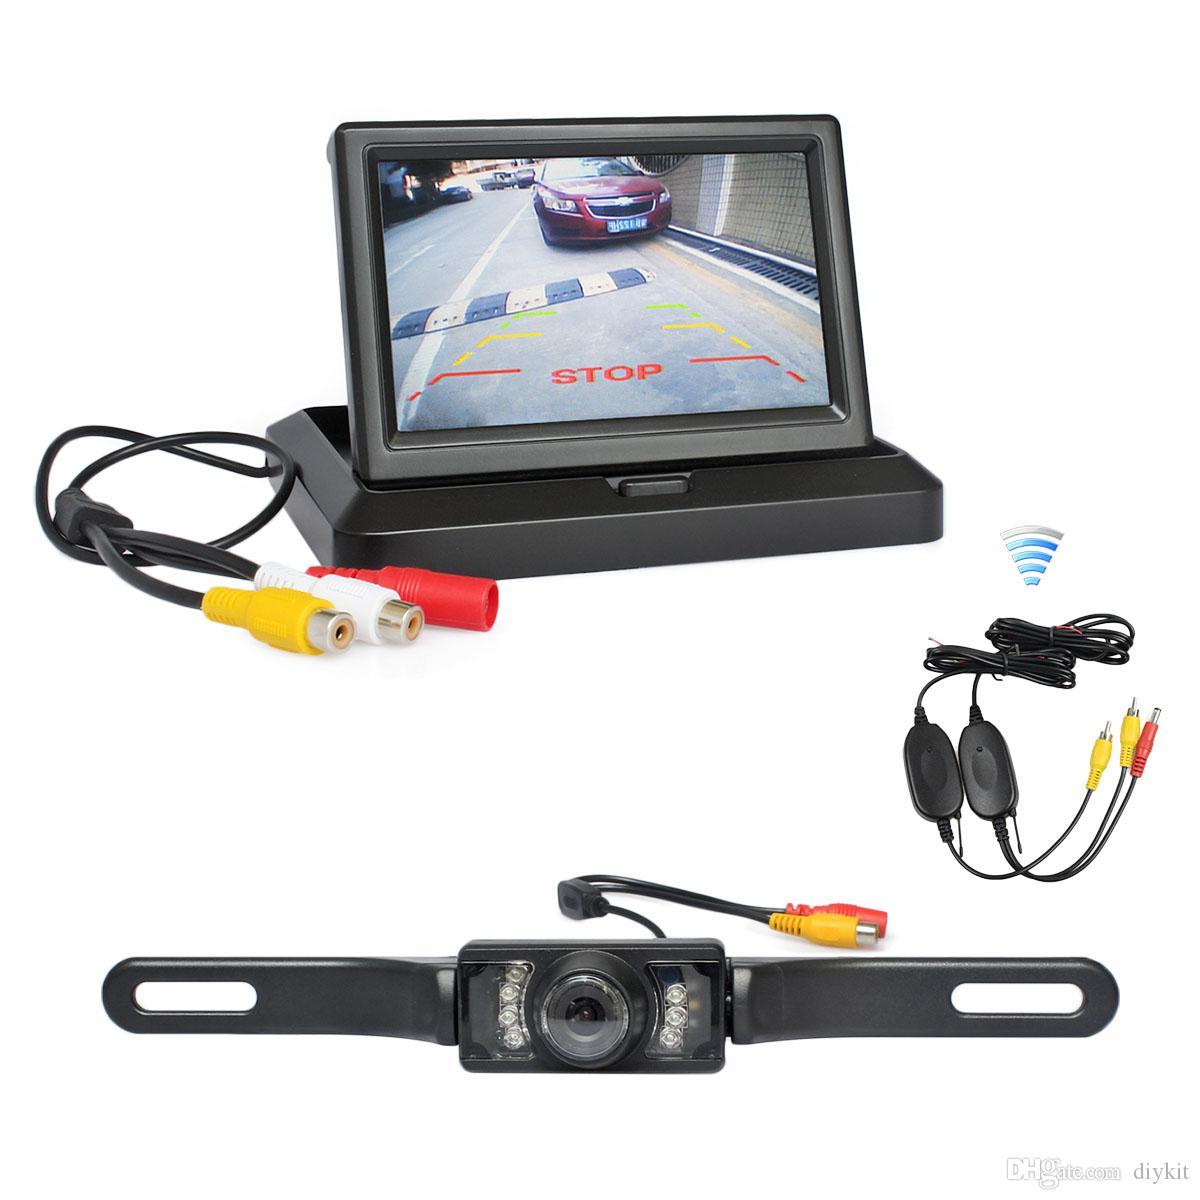 DIYKIT Wireless Parking System 5inch Foldable Rear View Monitor Car Monitor Waterproof IR Night Vision Rear View Car Camera